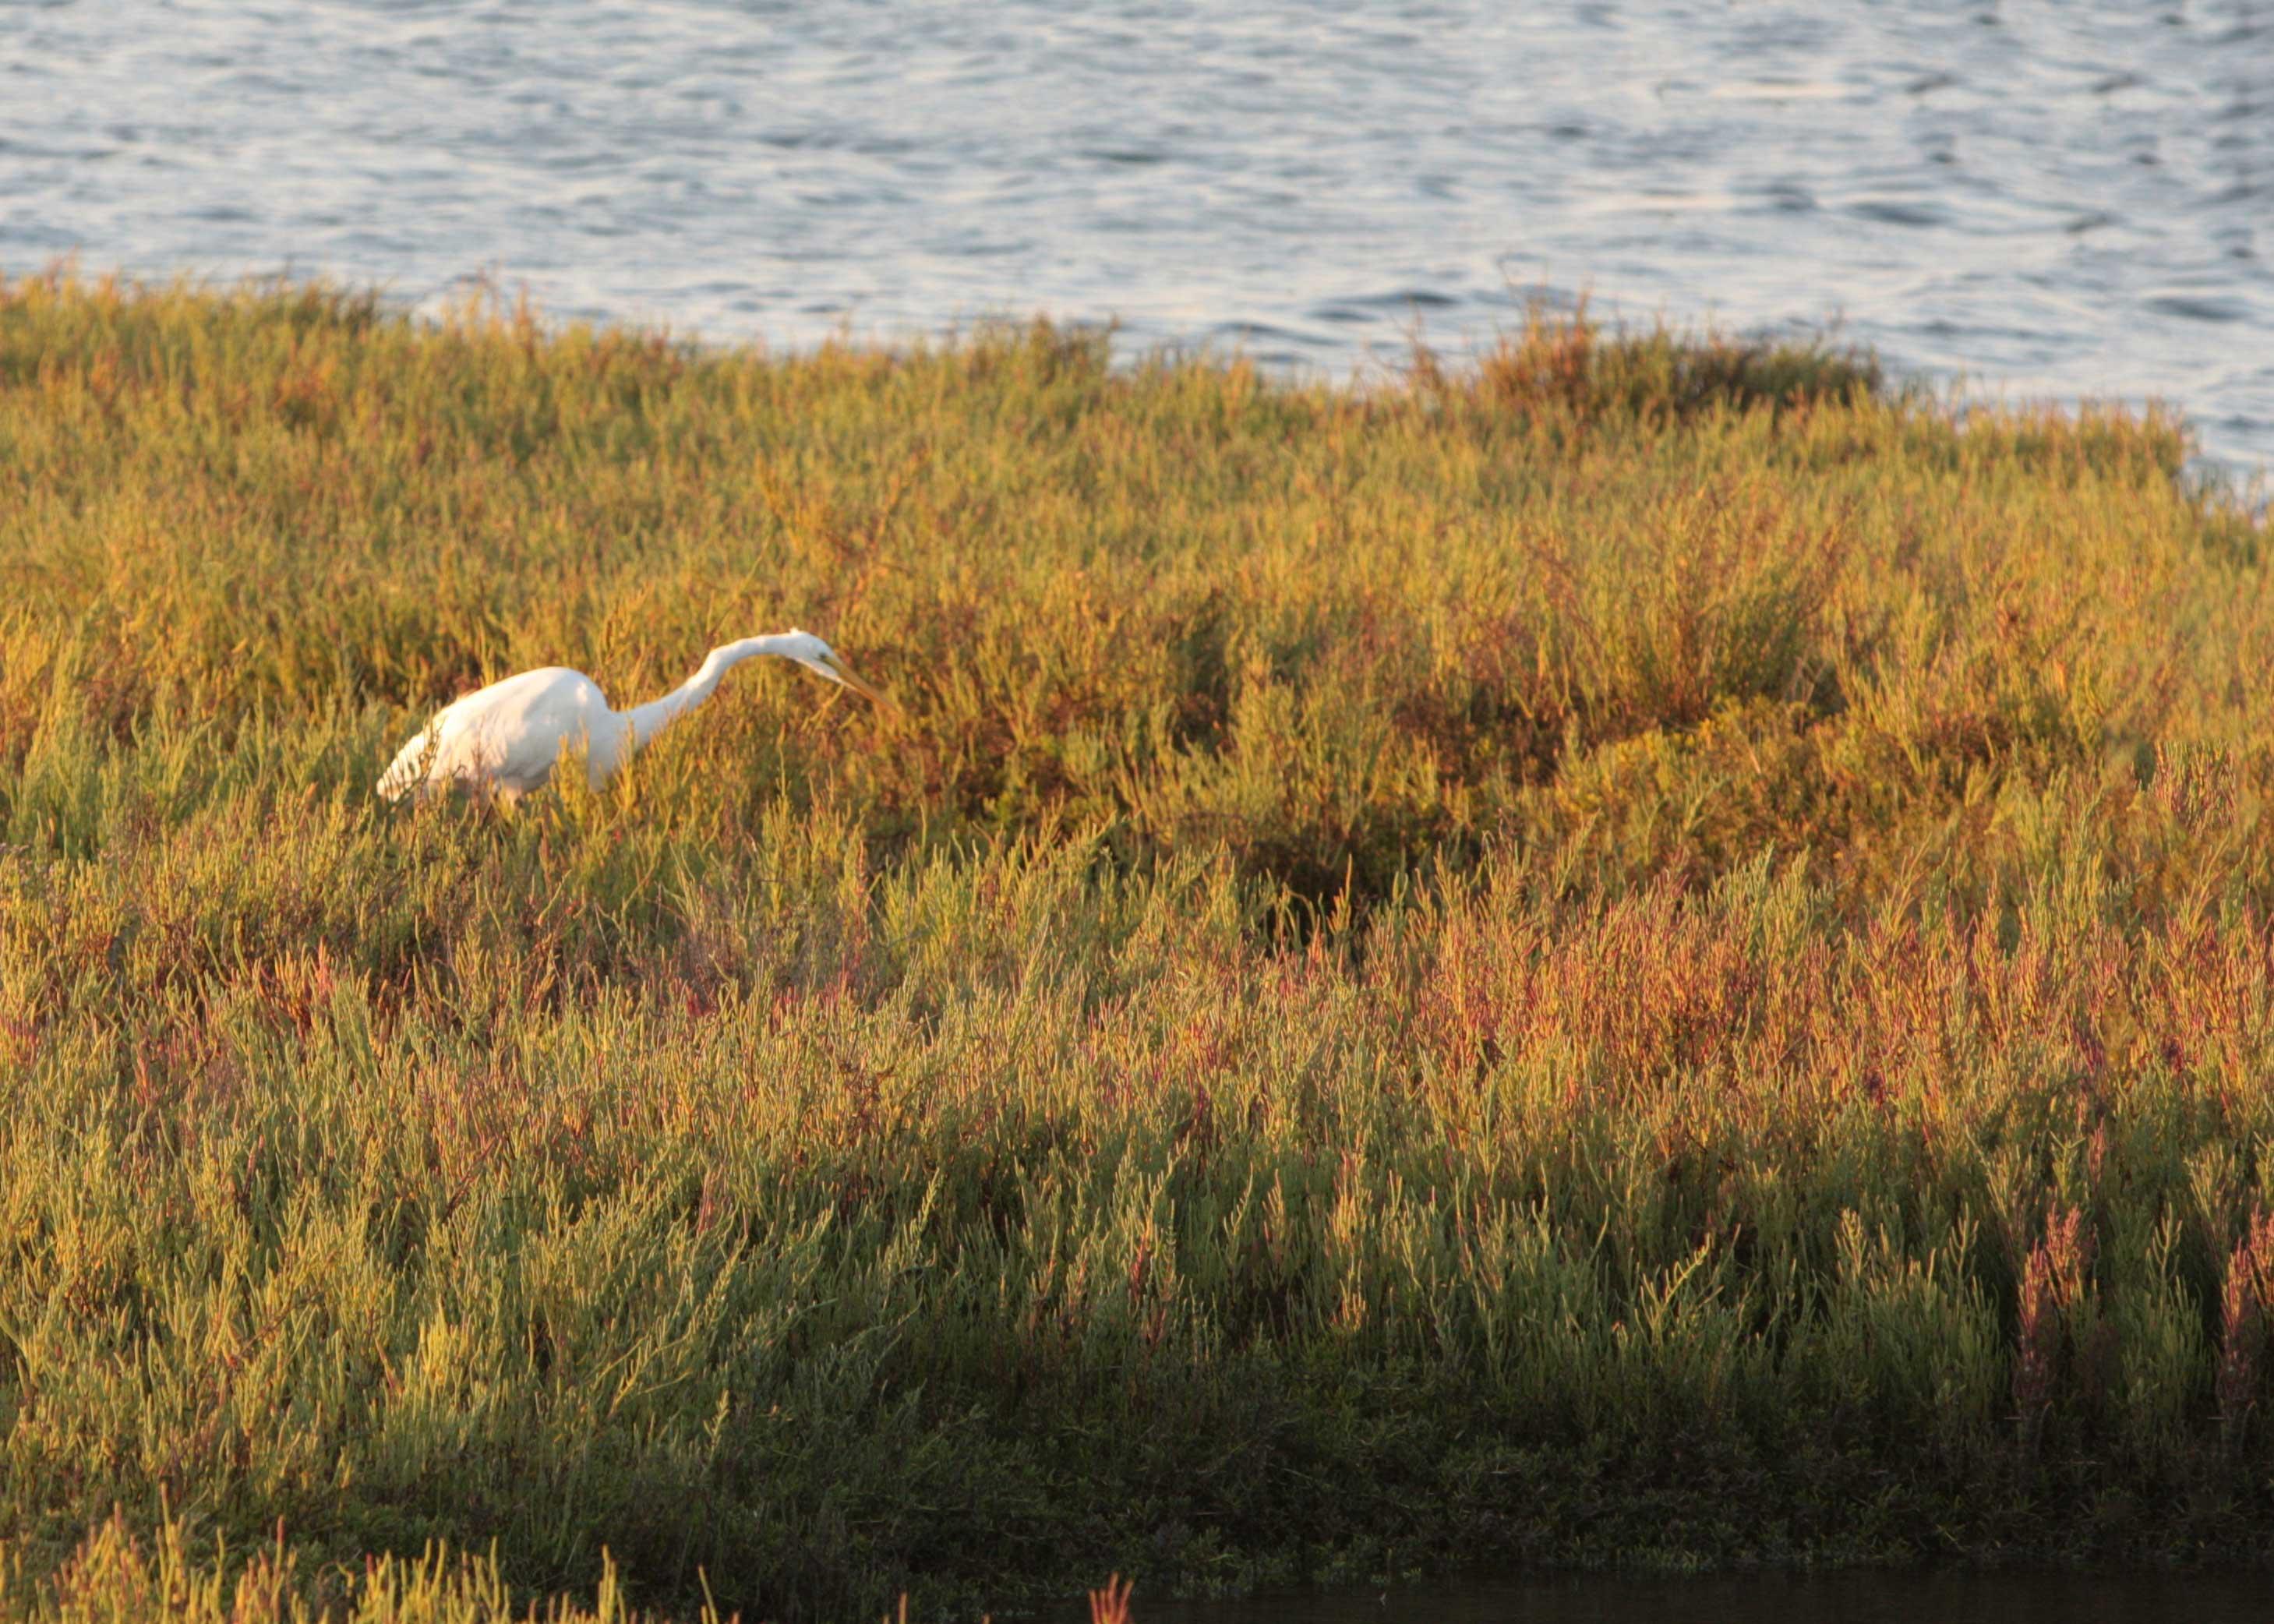 Bolsa Chica Wetland